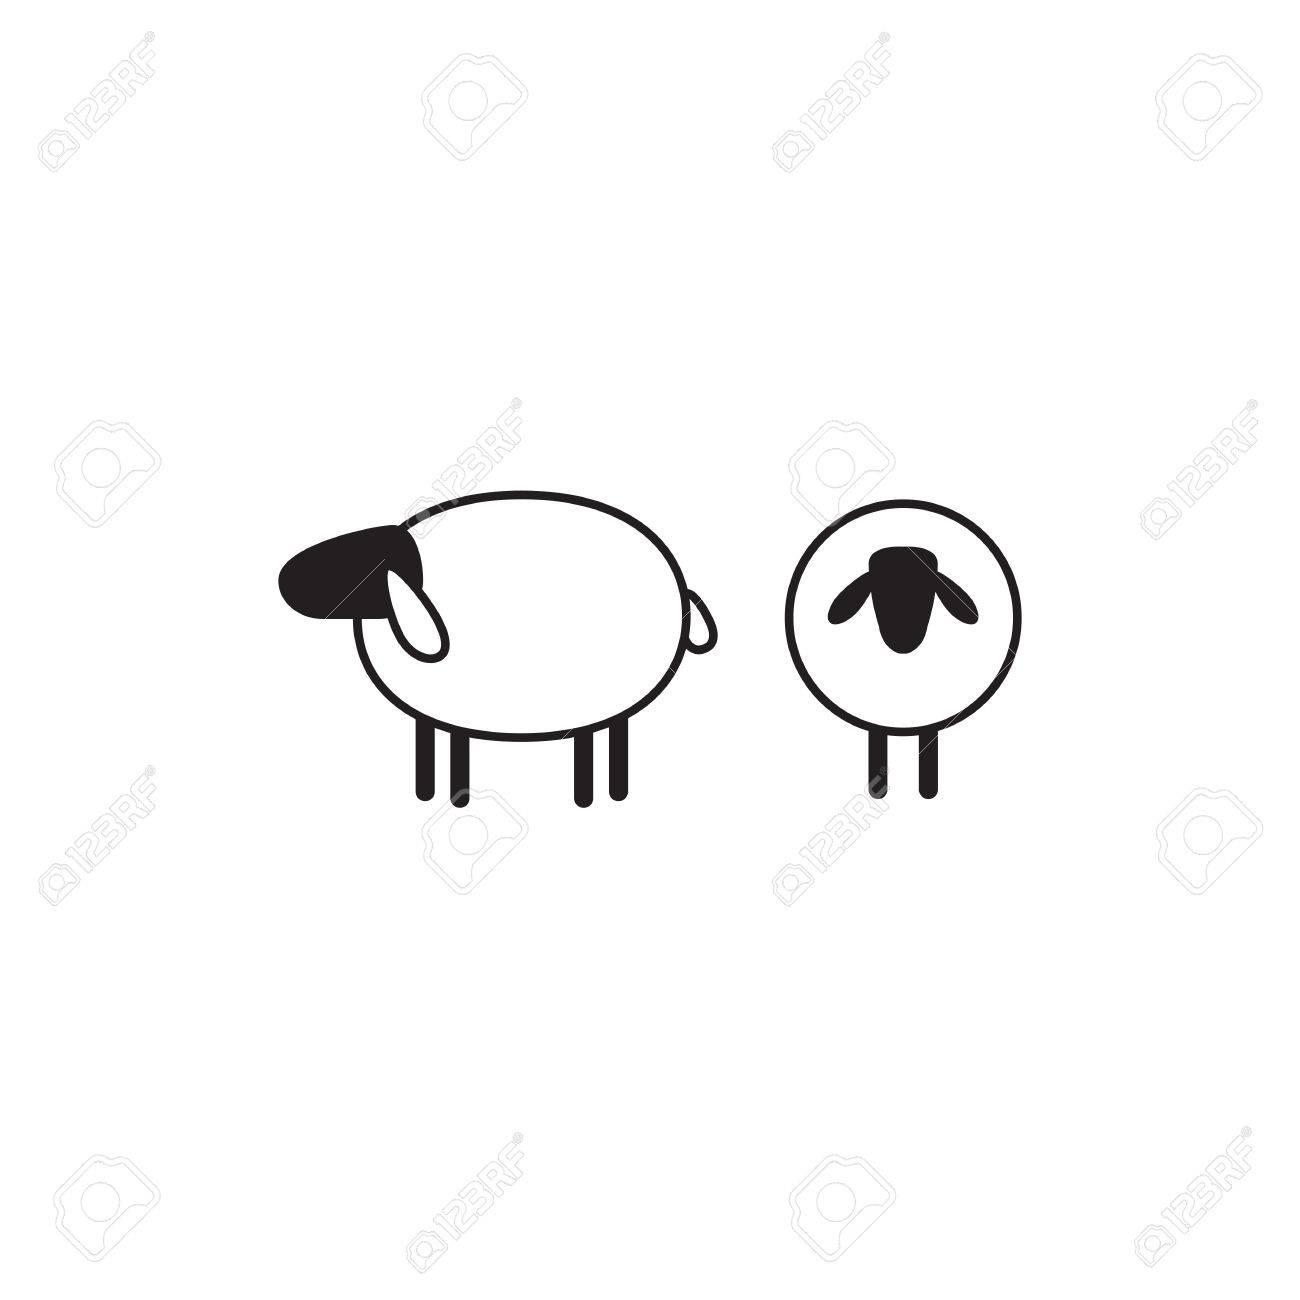 vector vector sheep or ram icon template pictogram modern emblem for market internet design decoration trendy simple lamb or ewe symbol - Dekoration Tren